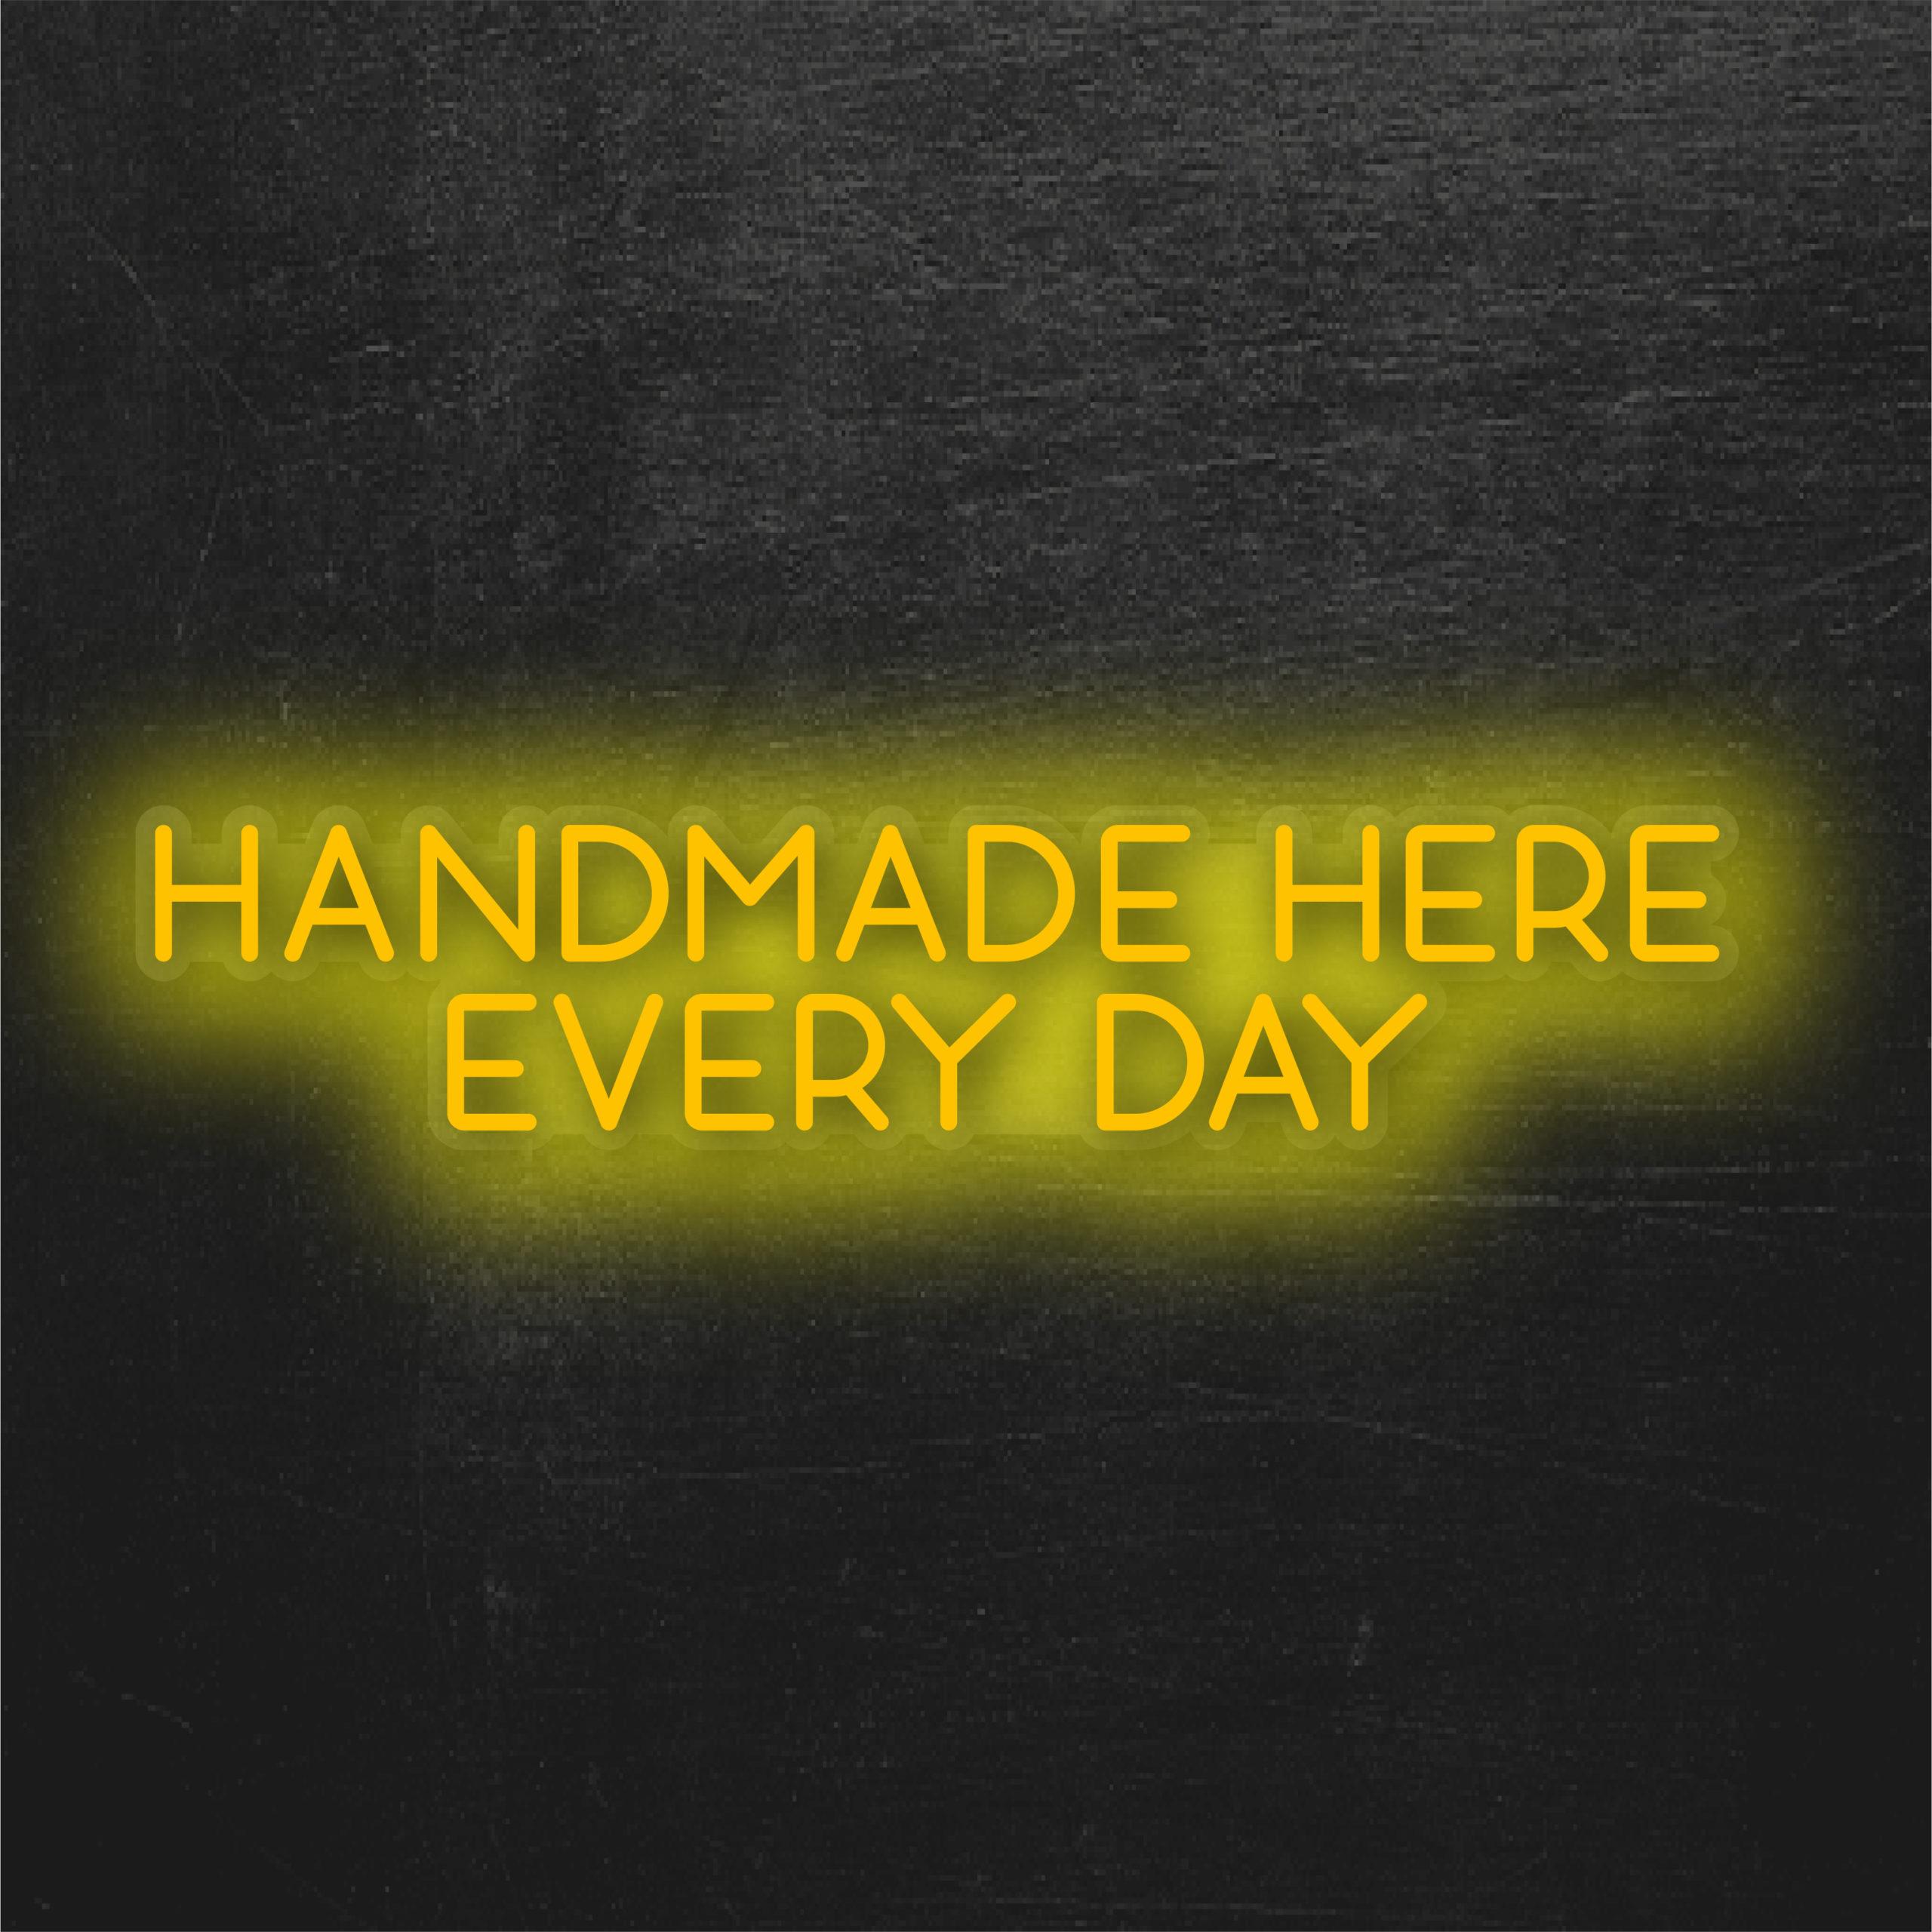 Handmade neon sign